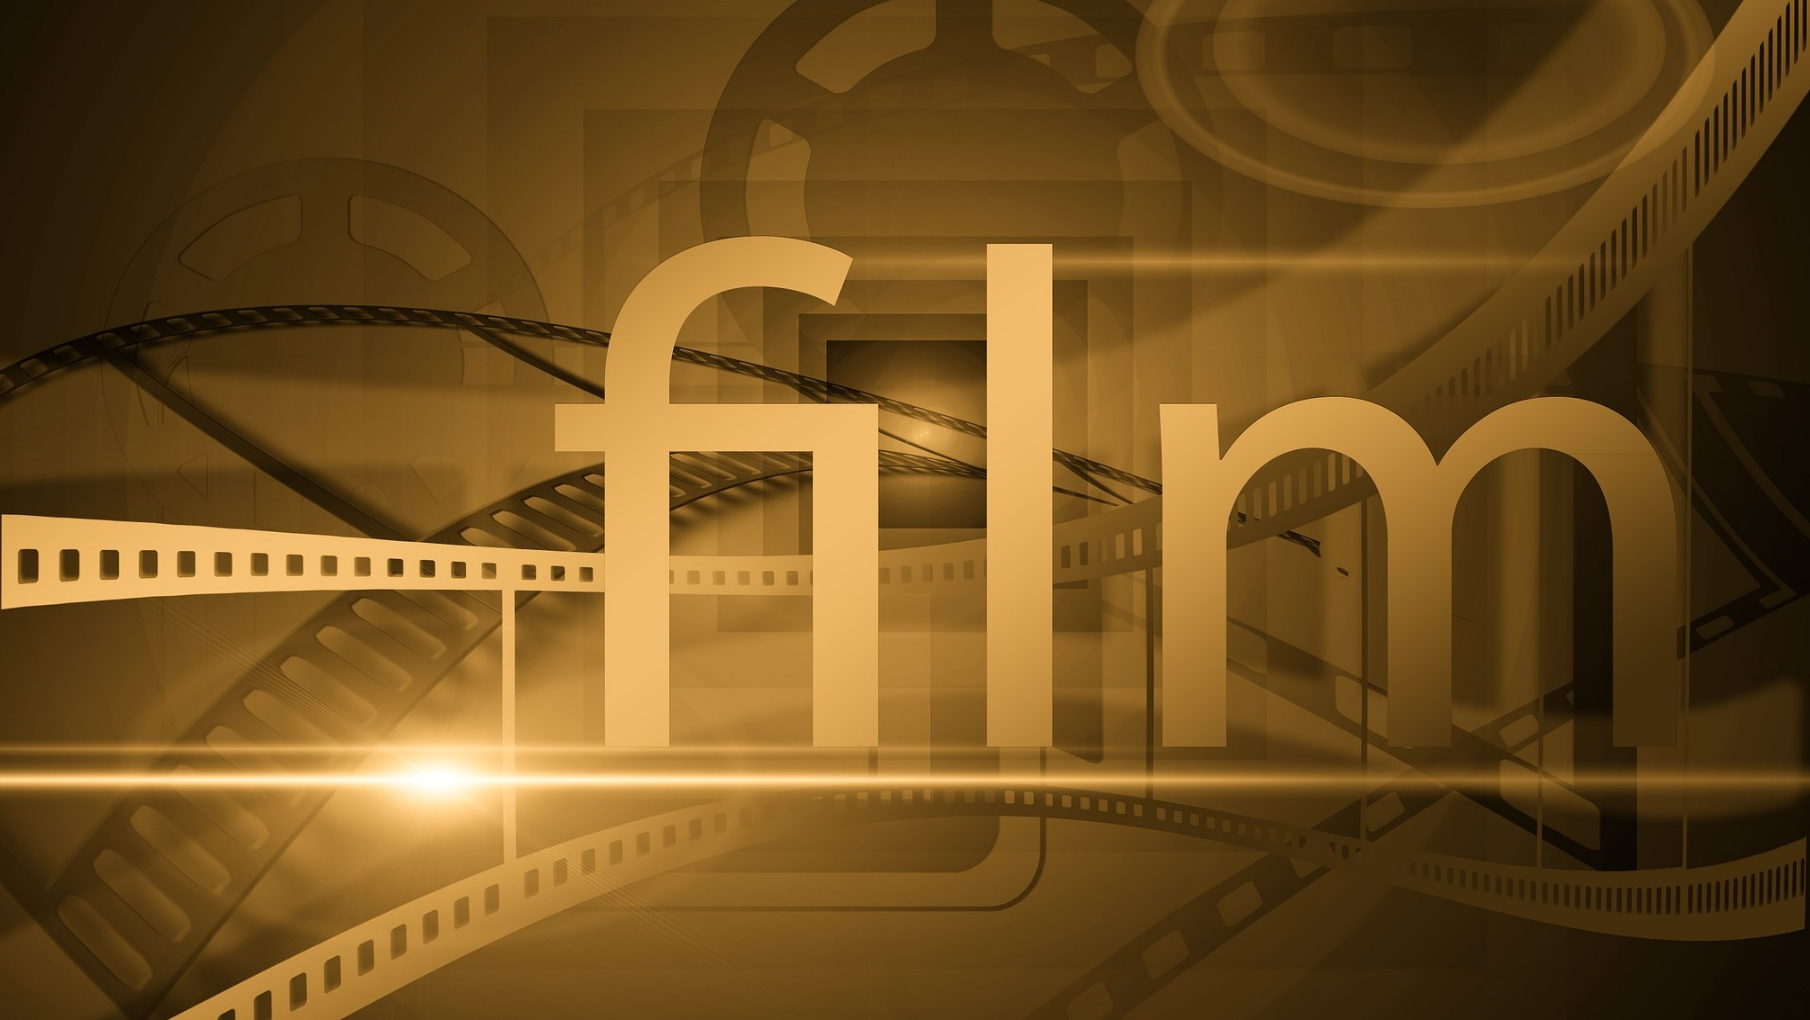 Filmvorschlag: Too Big to tell